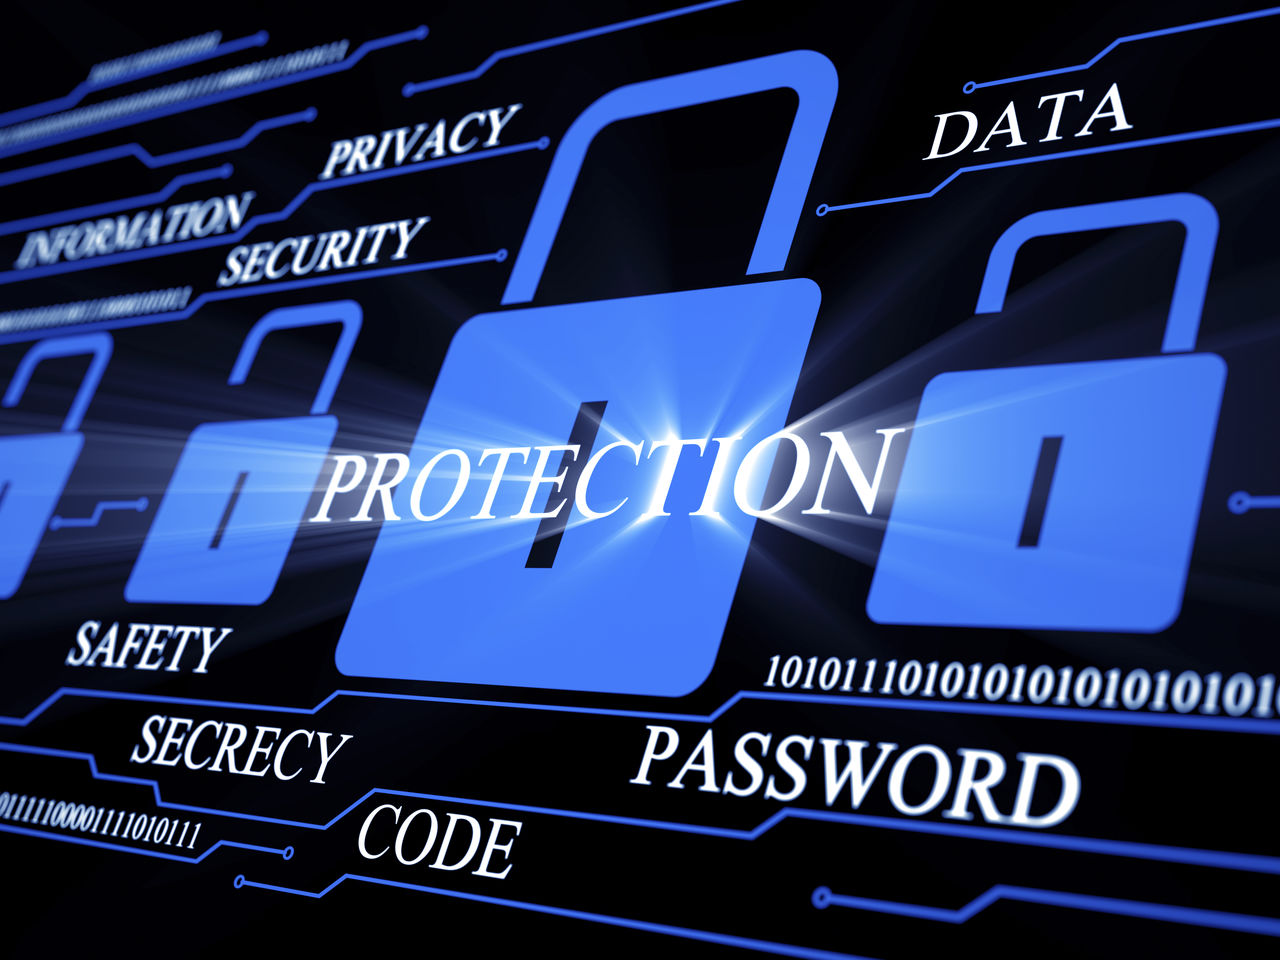 Fraud security password